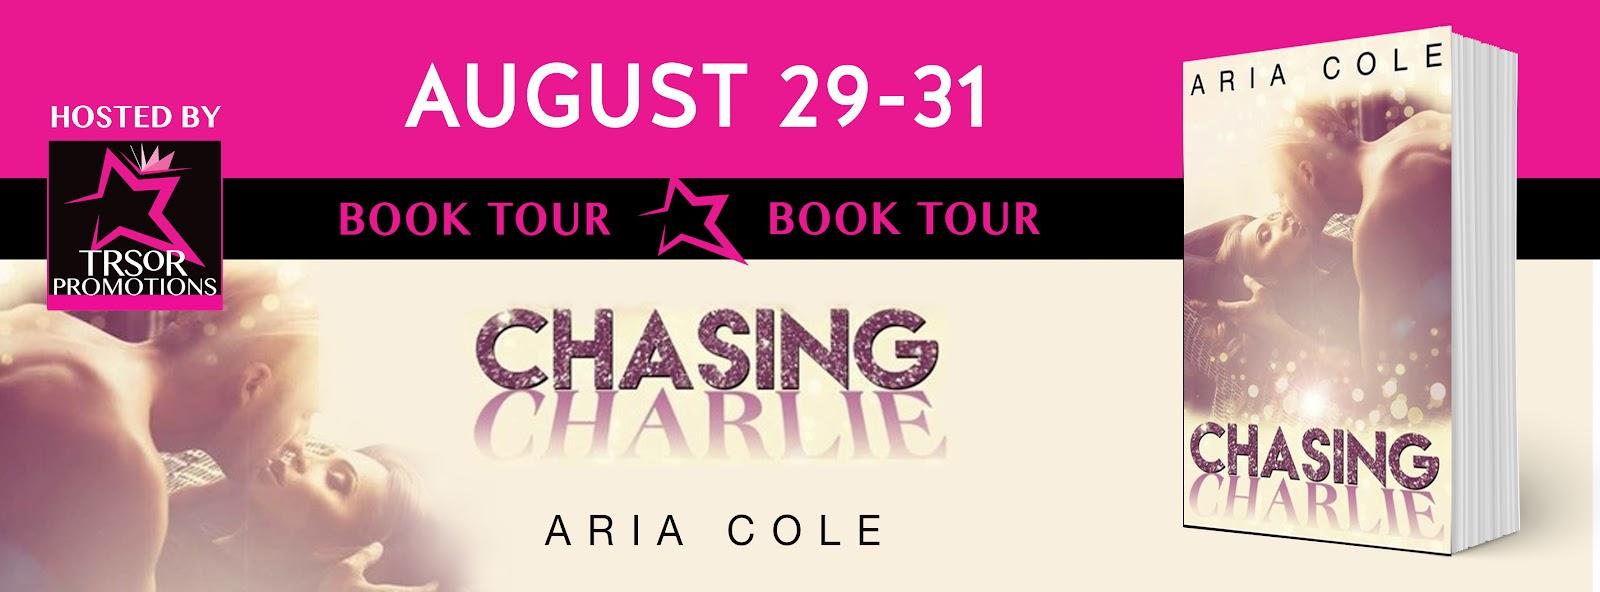 CHASING_CHARLIE_BOOK_TOUR.jpg